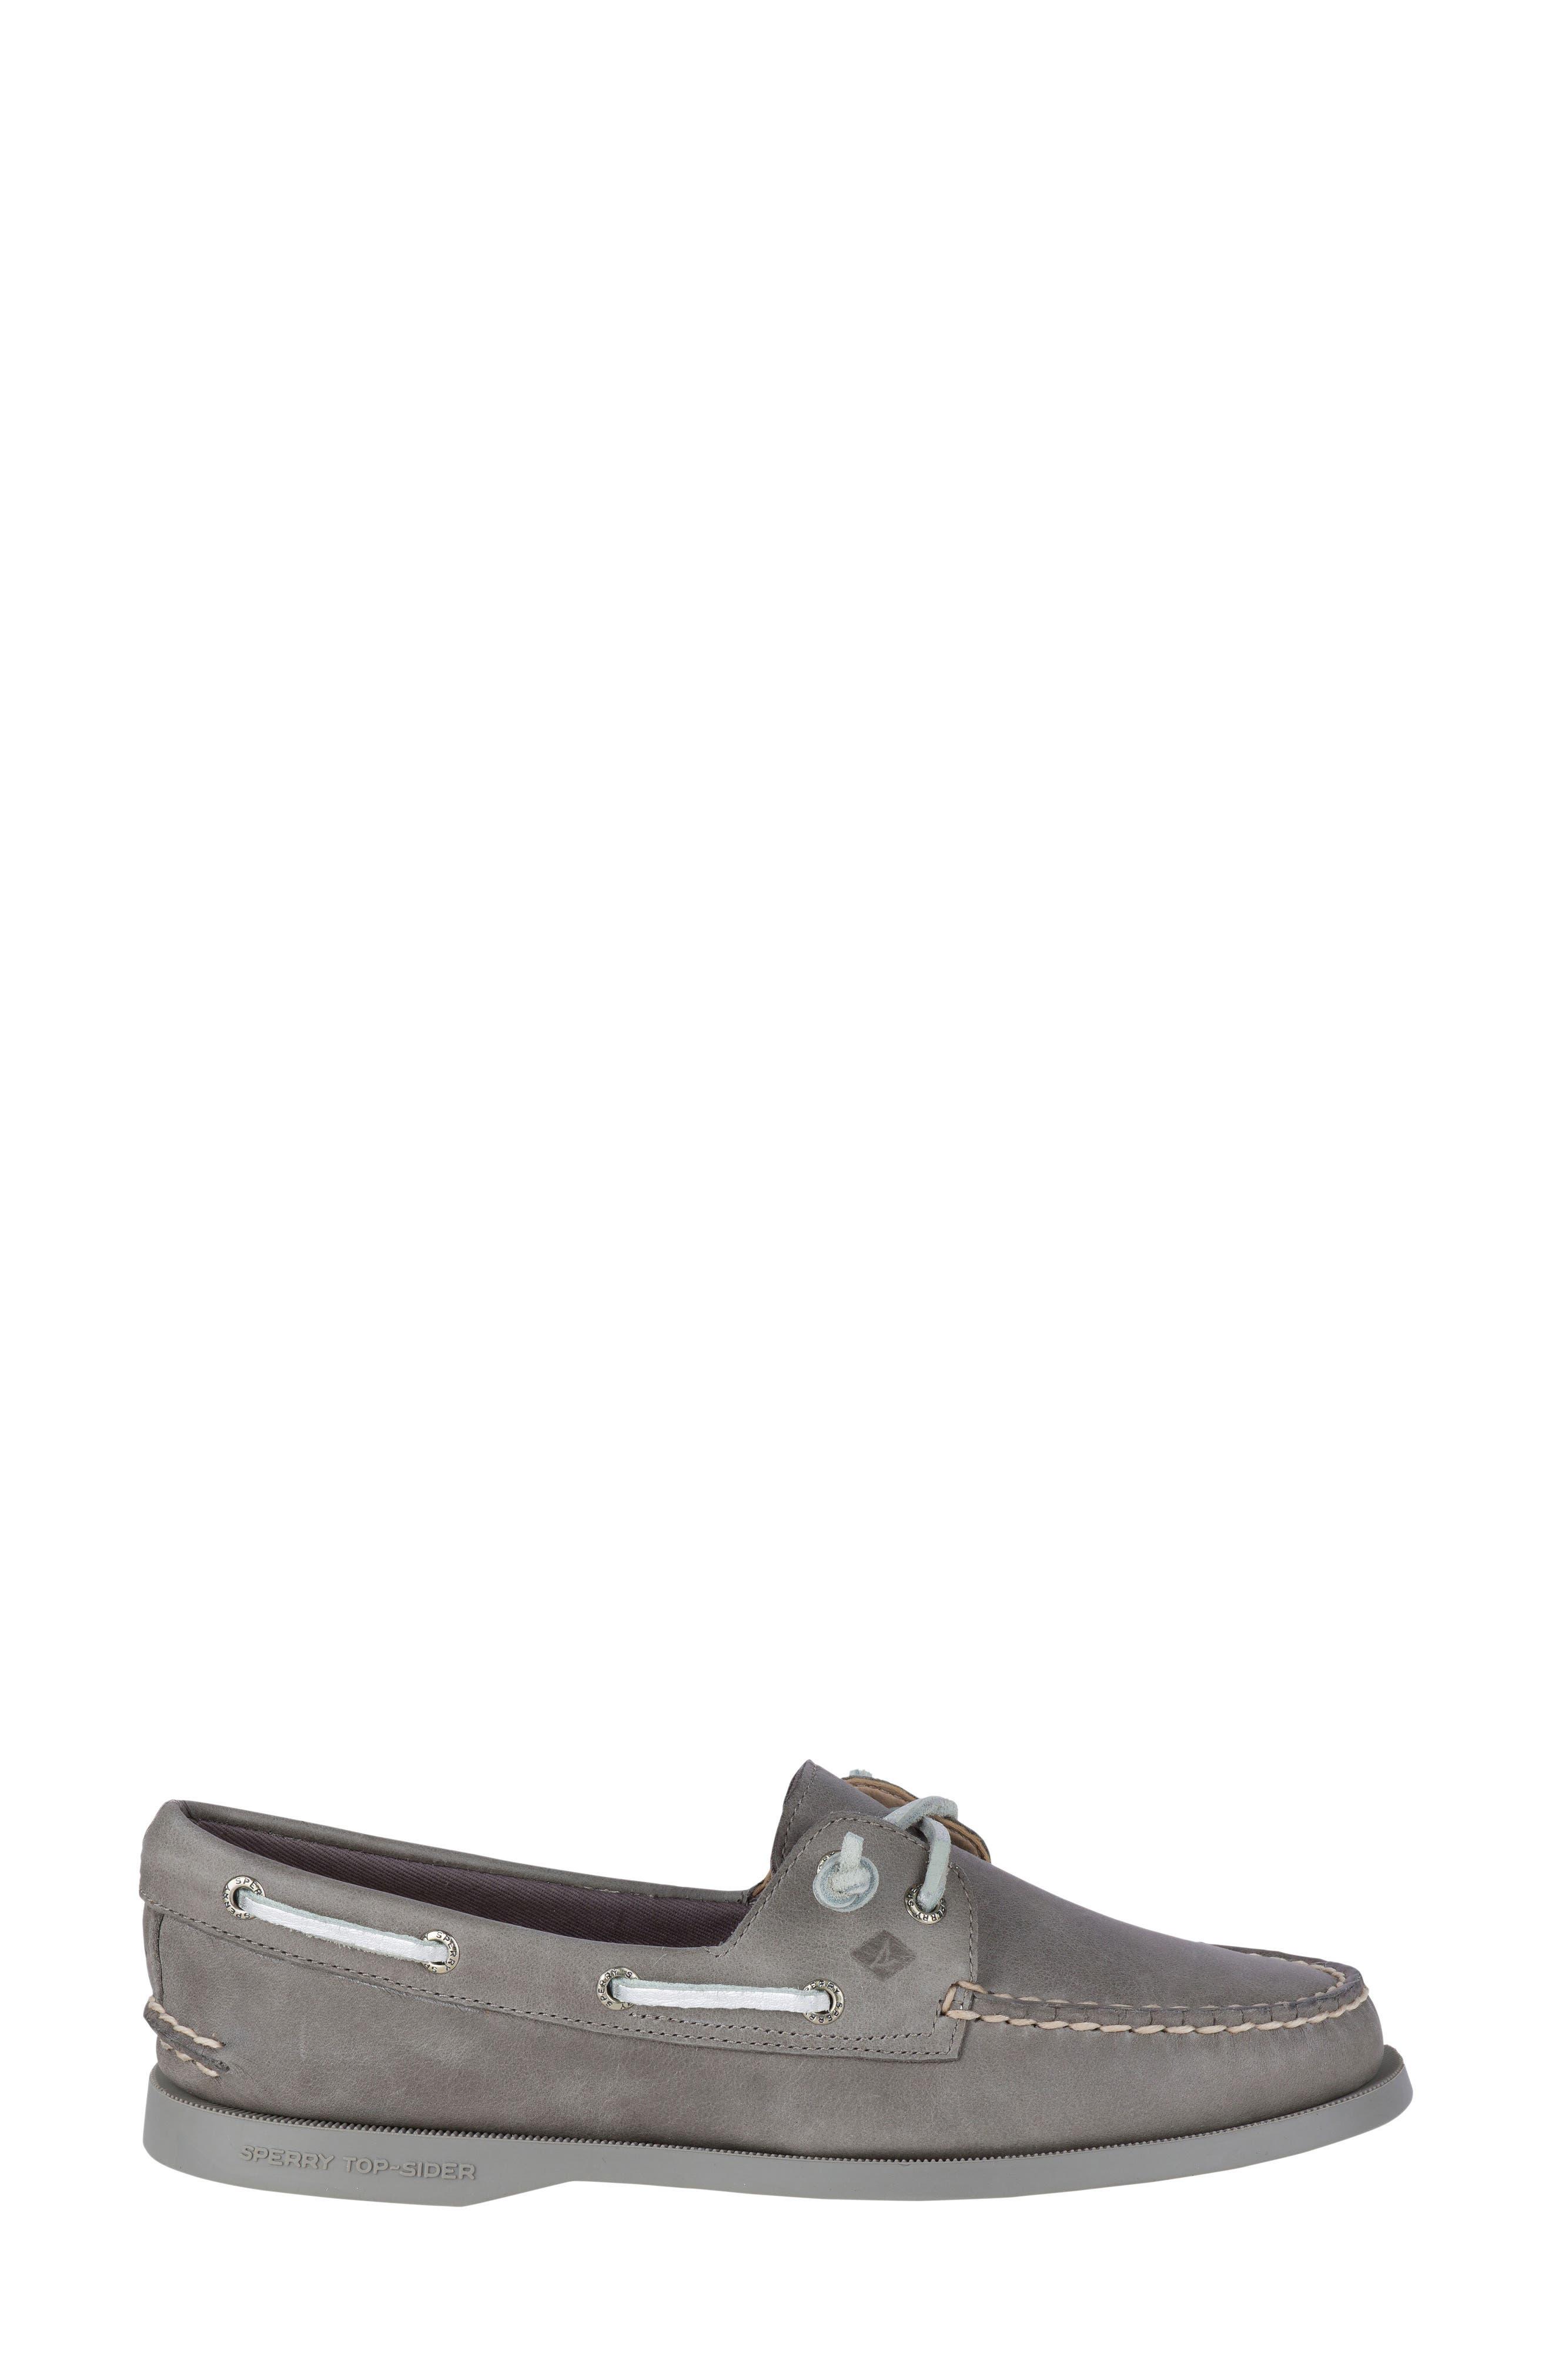 Vida Boat Shoe,                             Alternate thumbnail 3, color,                             Driftwood Leather